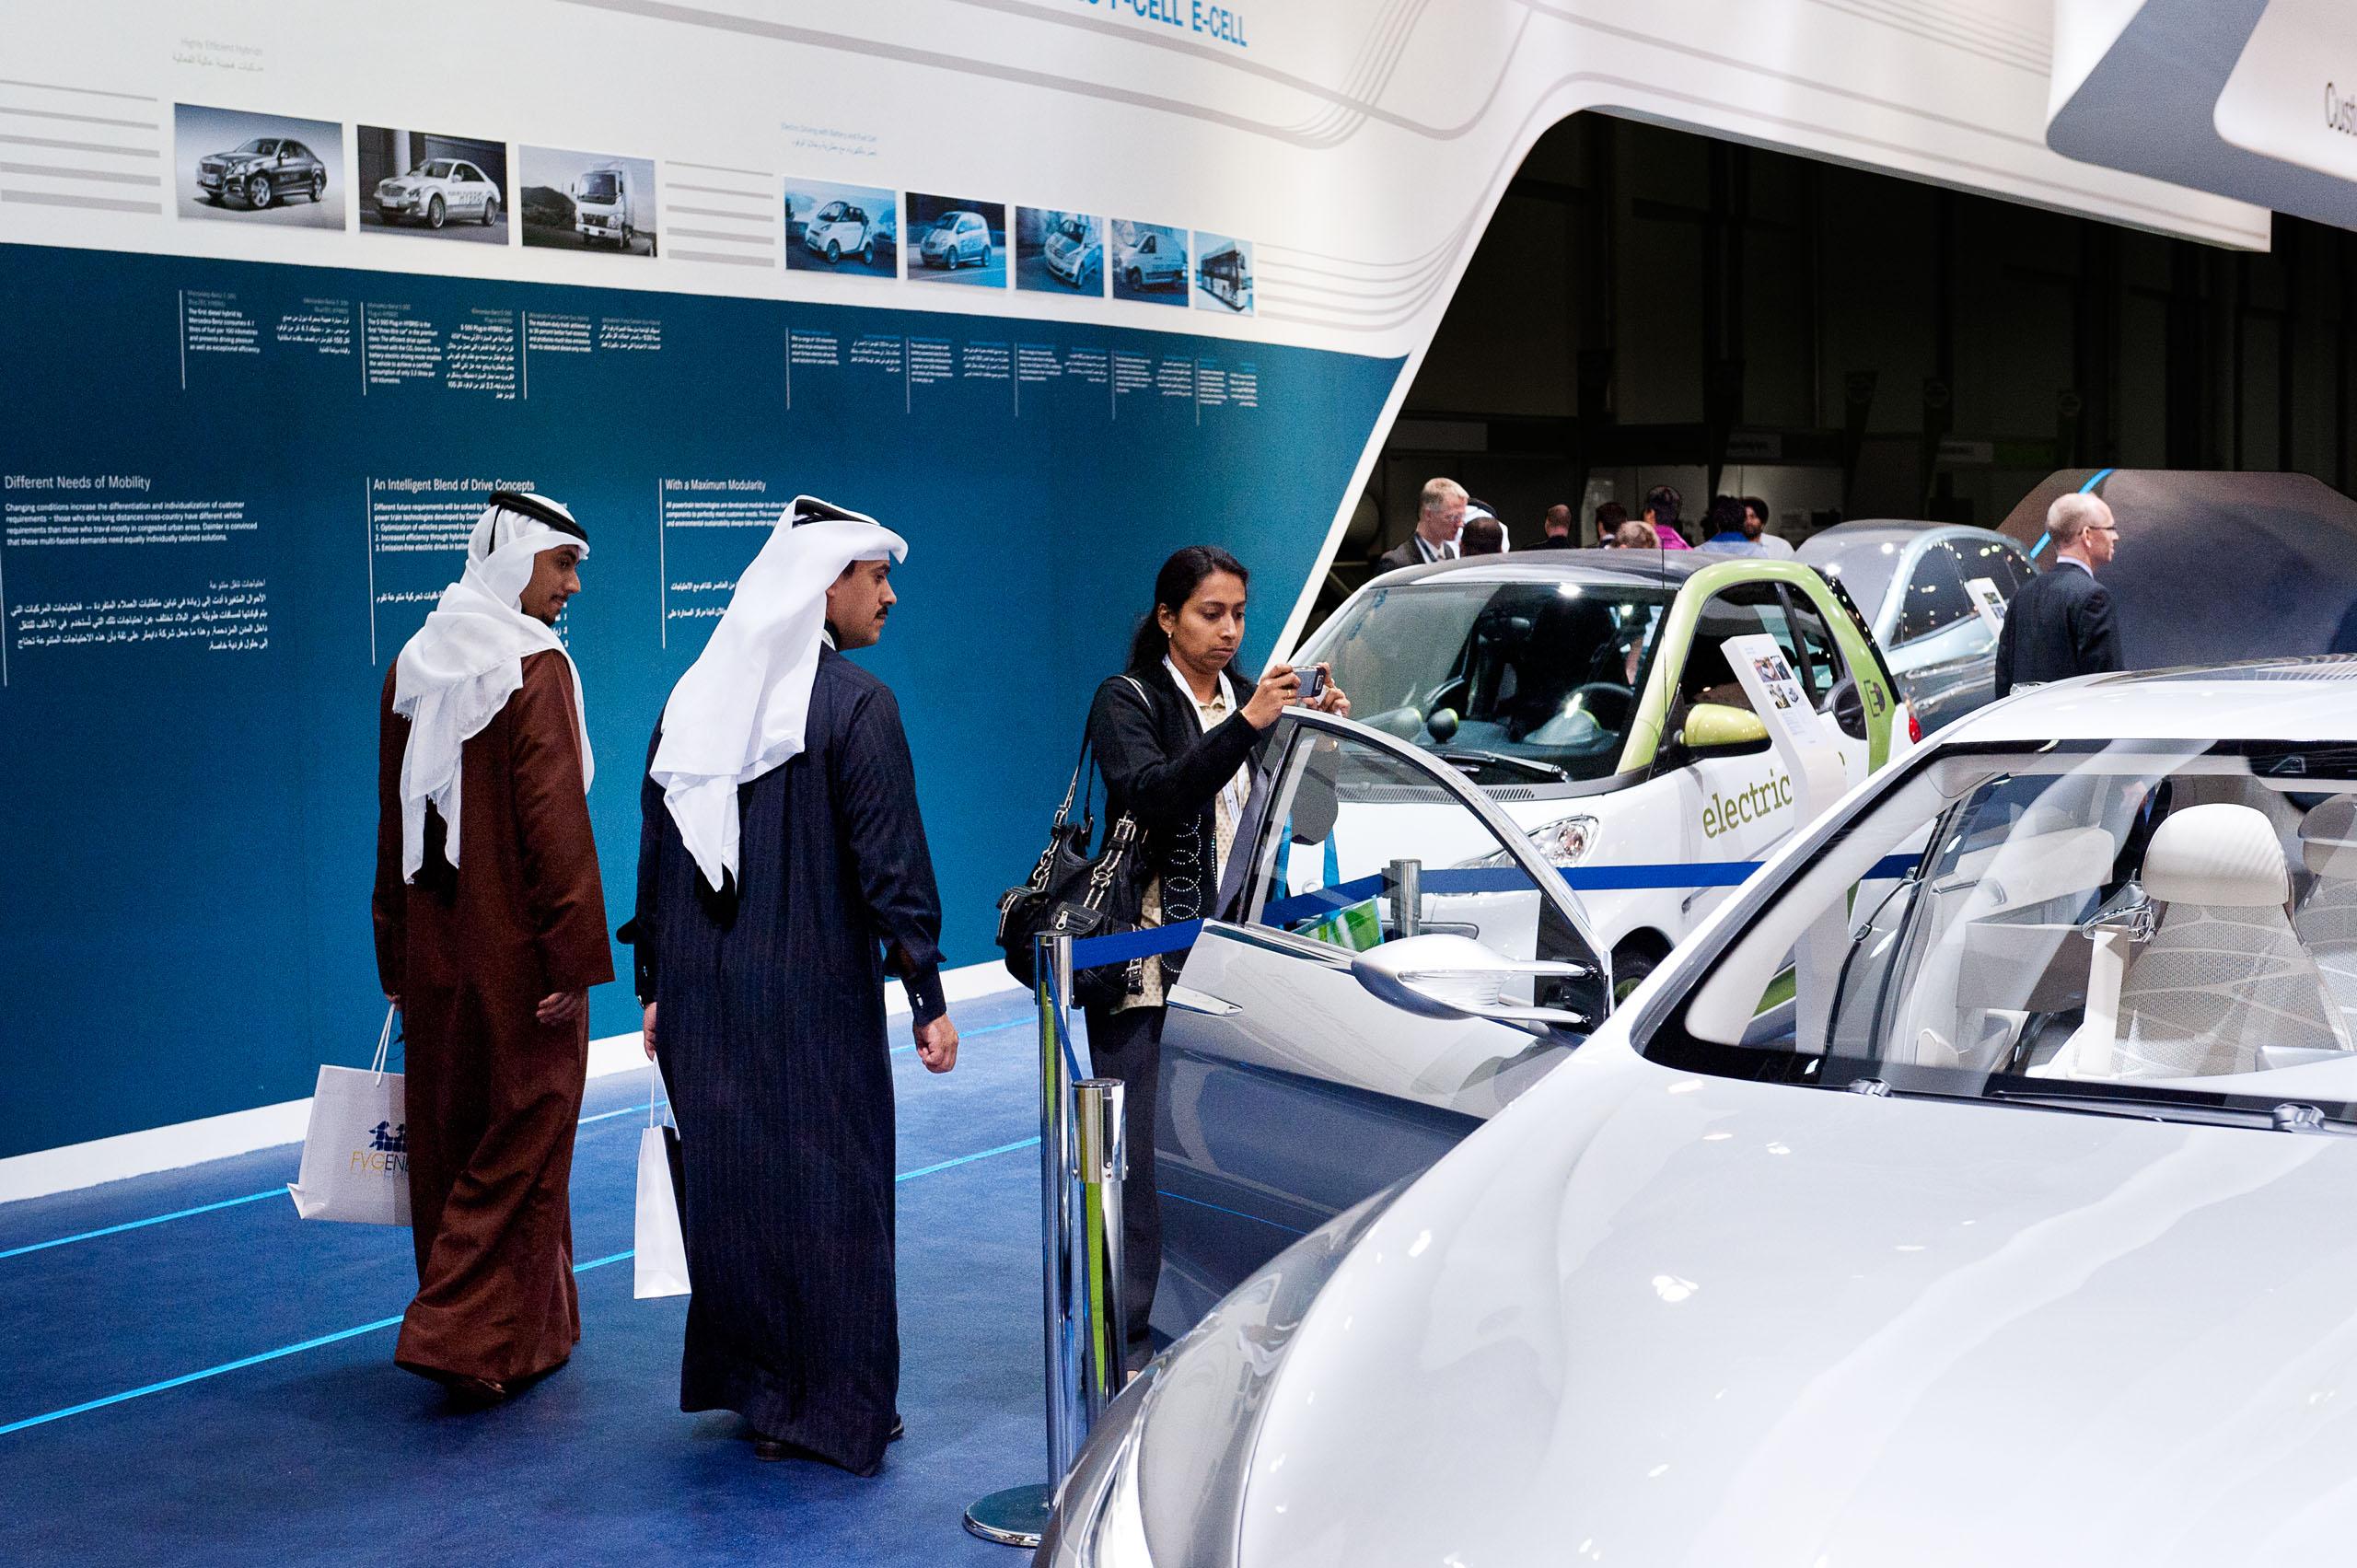 DAIMLER / WORLD FUTURE ENERGY SUMMIT in Abu Dhabi